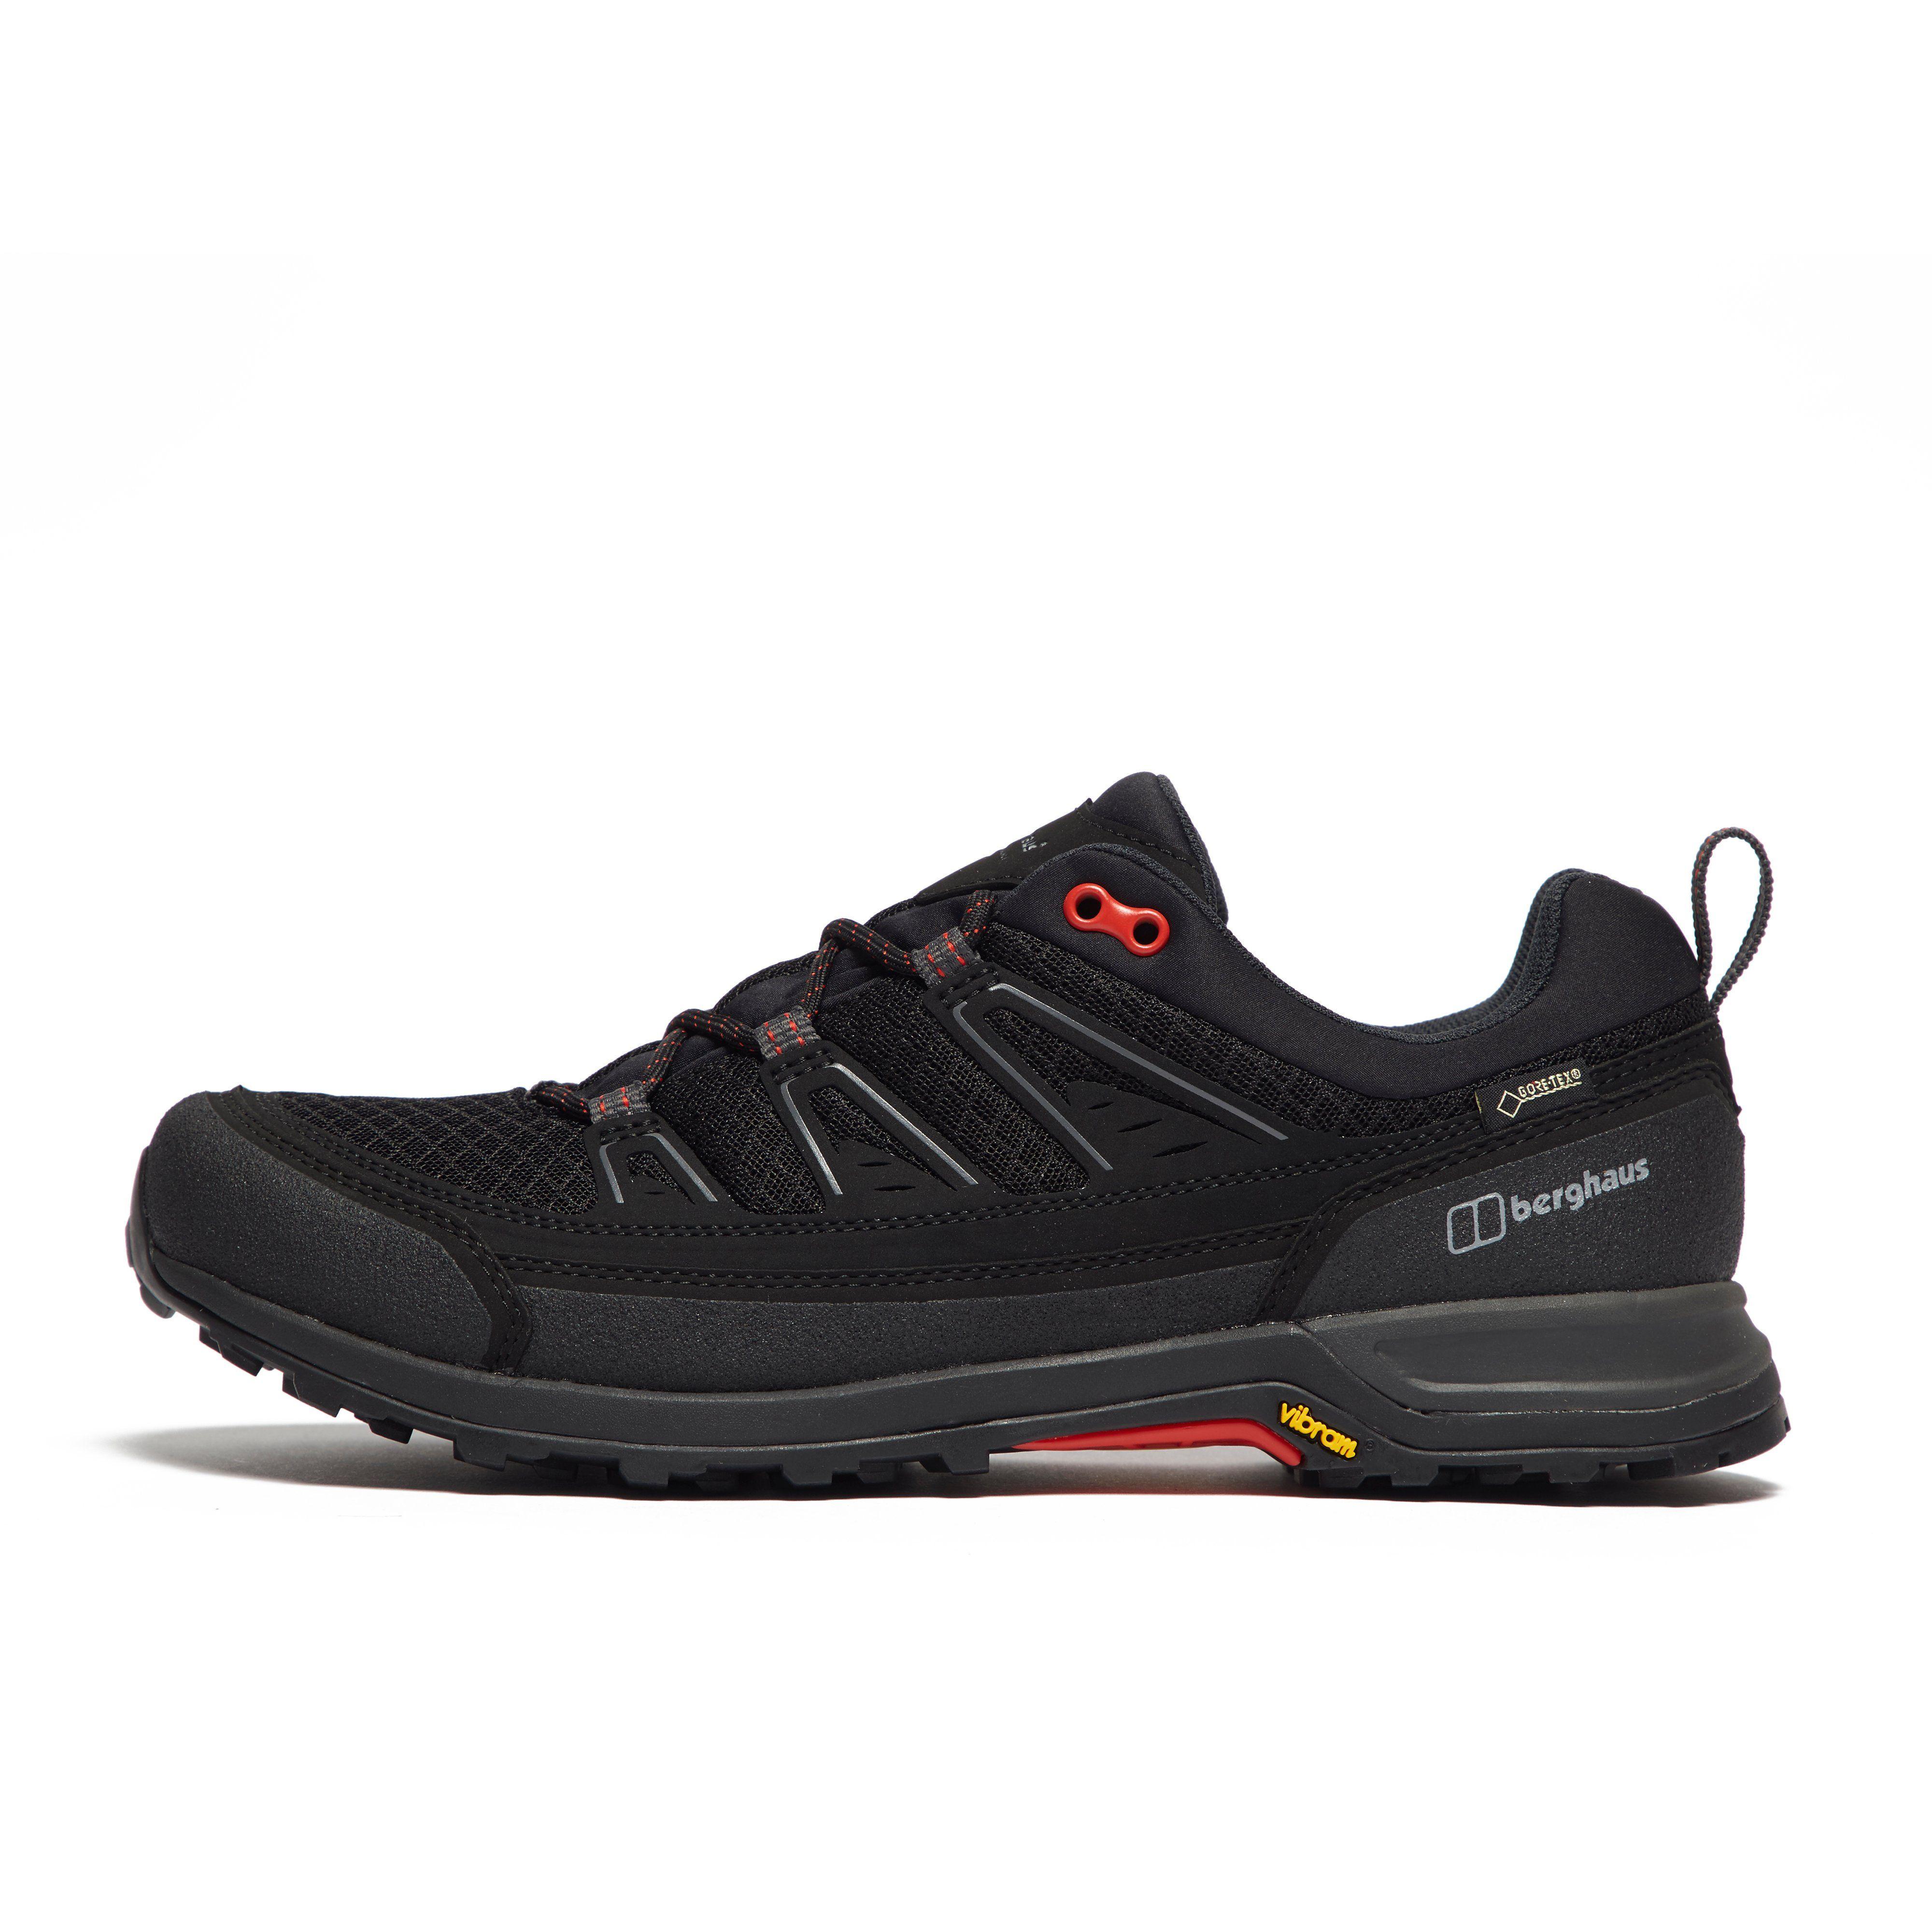 Berghaus Explorer Active GTX Men's Walking Shoes